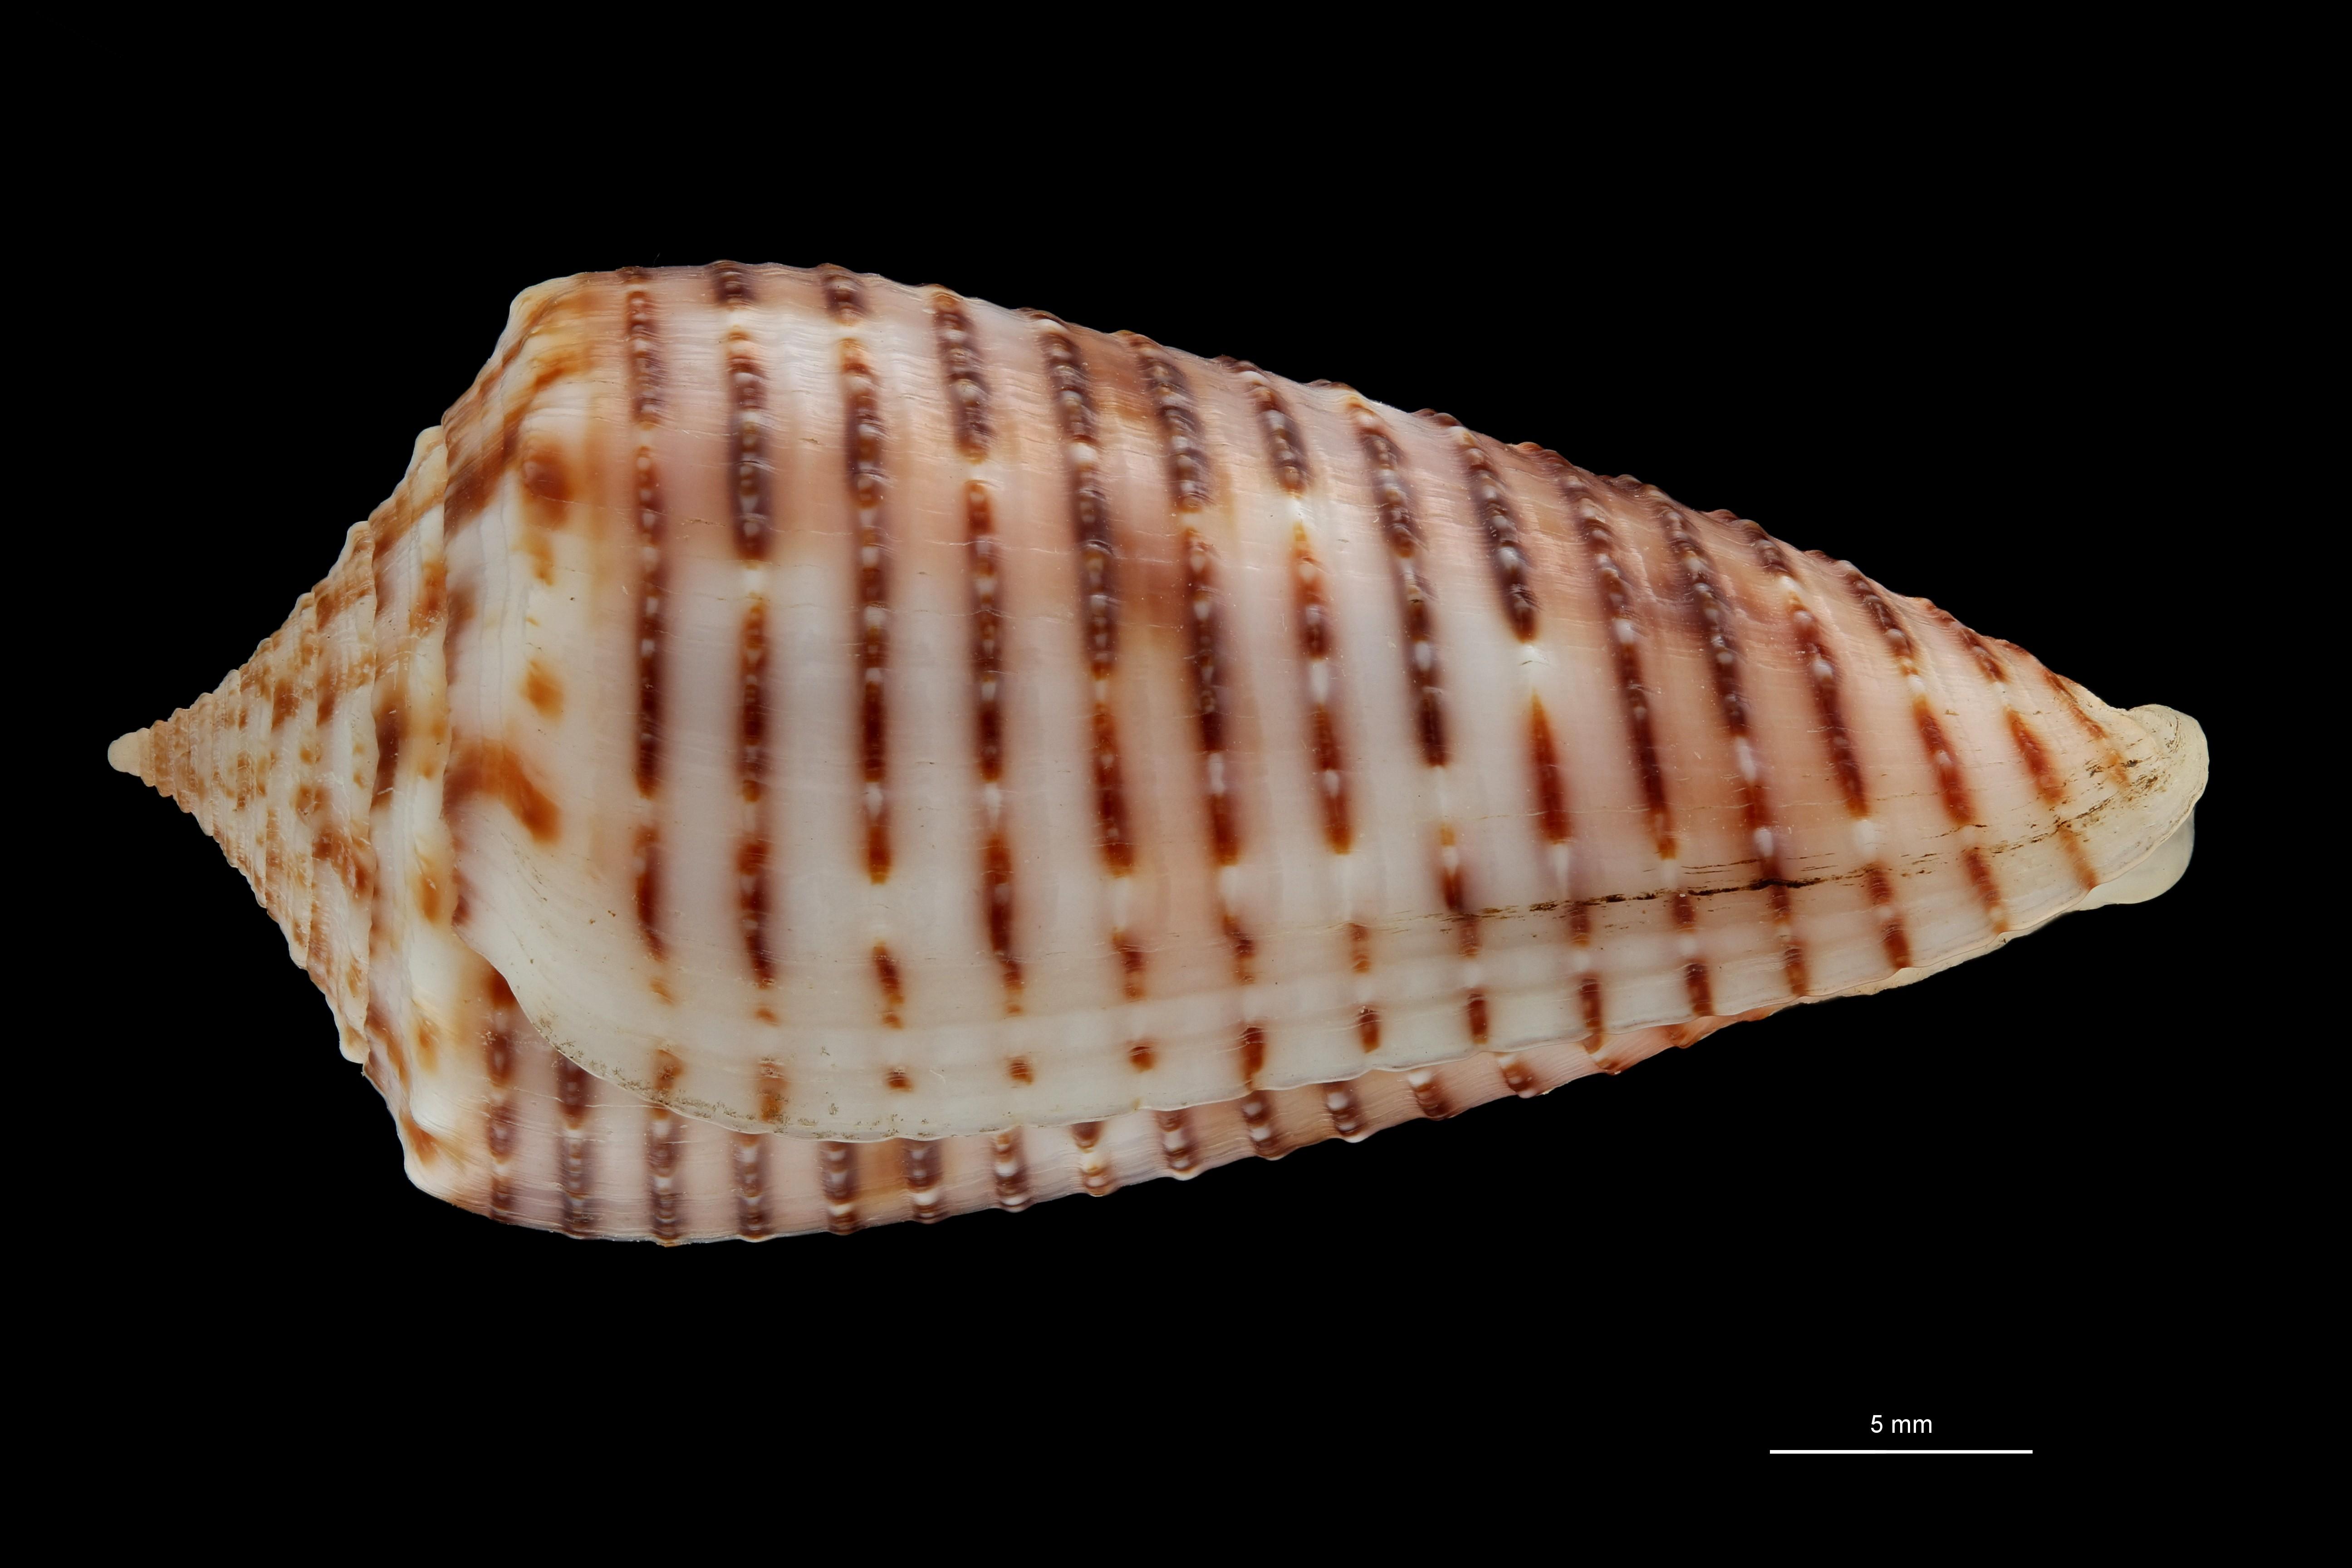 BE-RBINS-INV MT 464 Conus proximus cebuensis Ht L ZS PMax Scaled.jpg